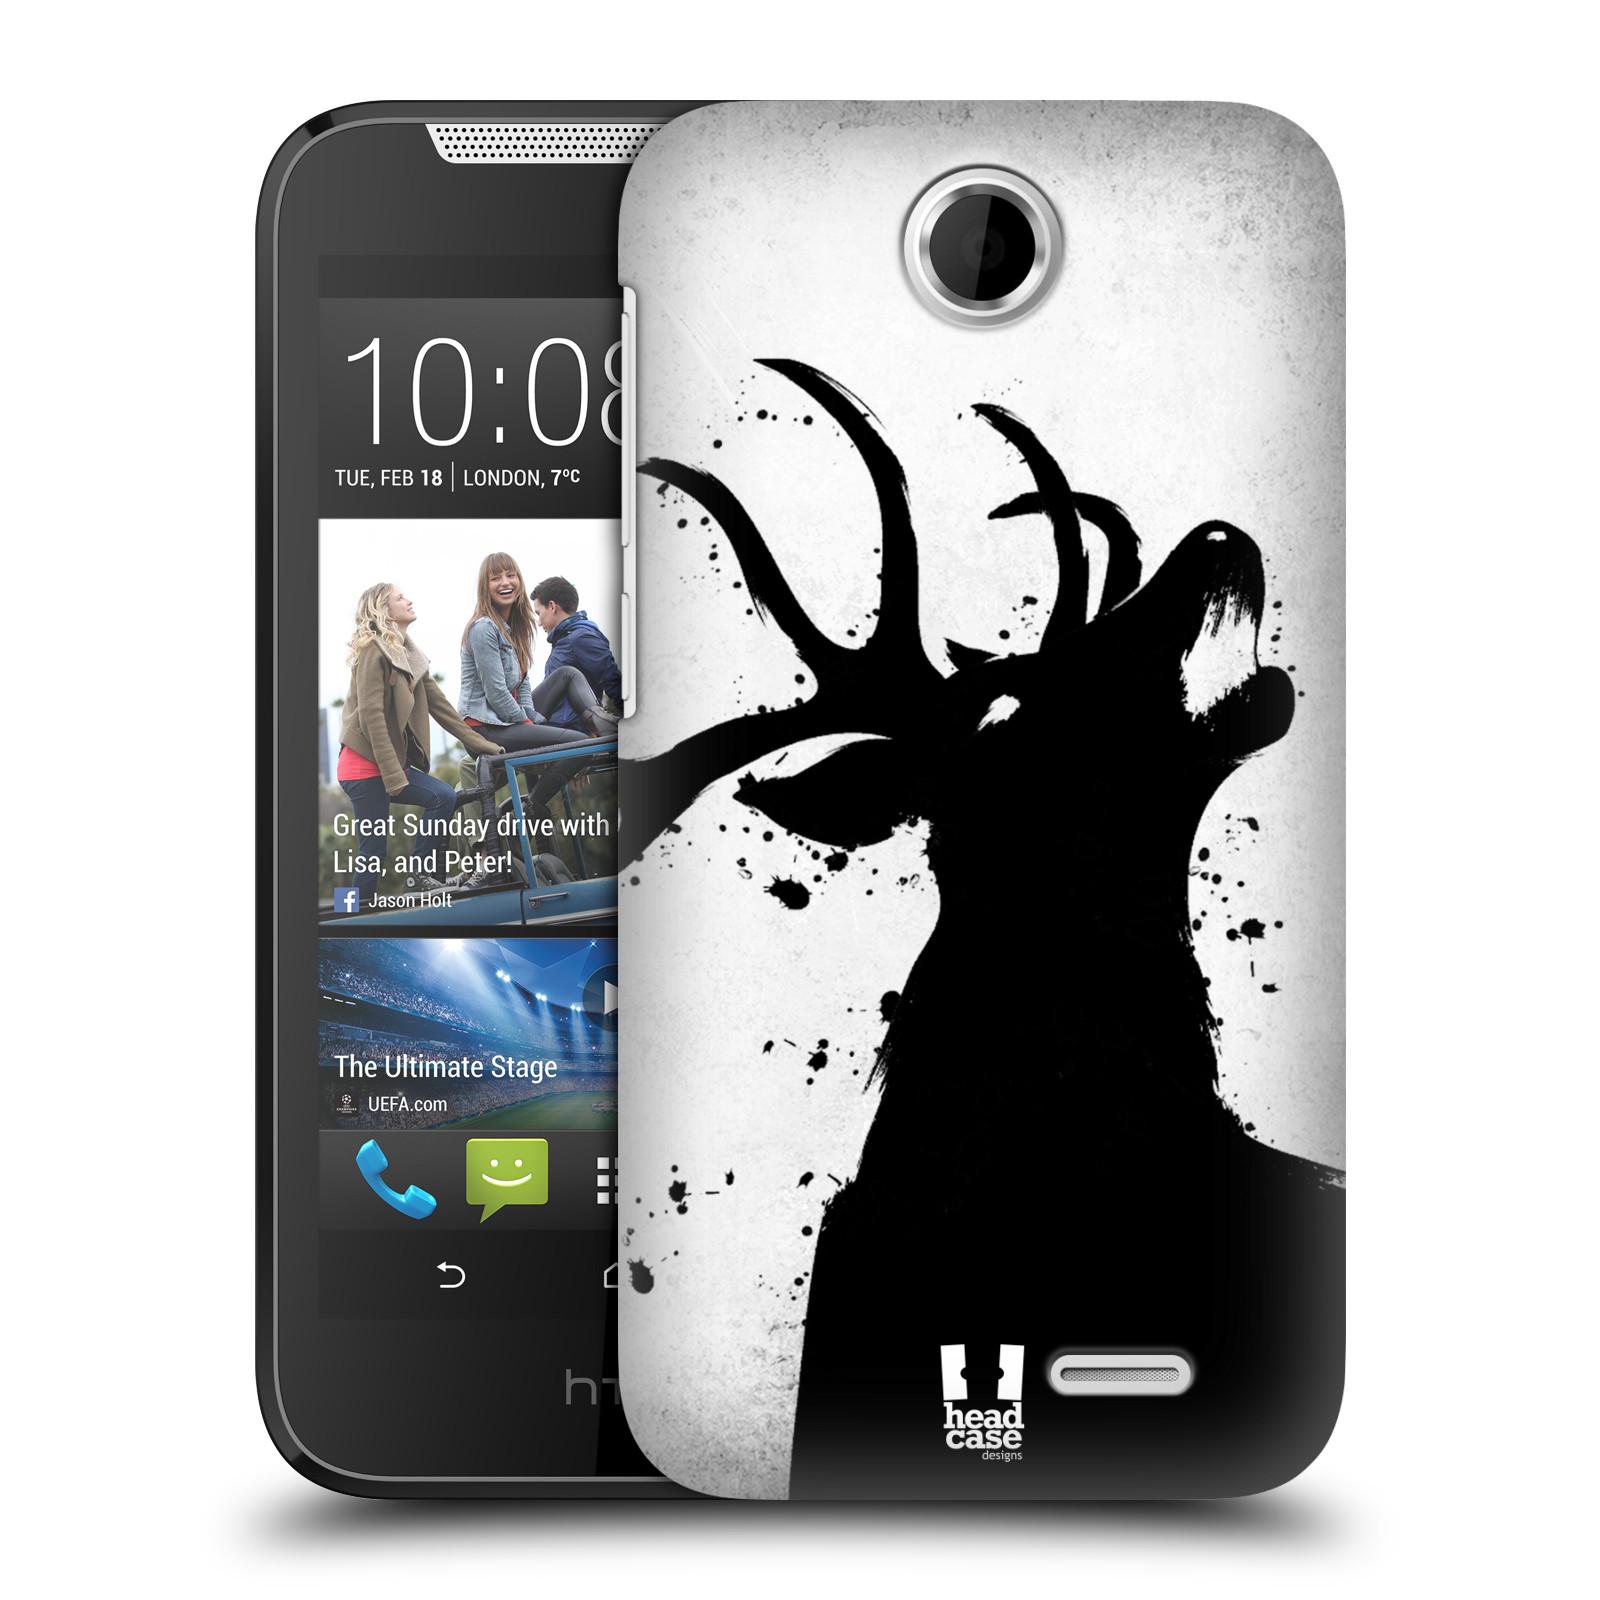 HEAD CASE plastový obal na mobil HTC Desire 310 vzor Kresba tuš zvíře jelen